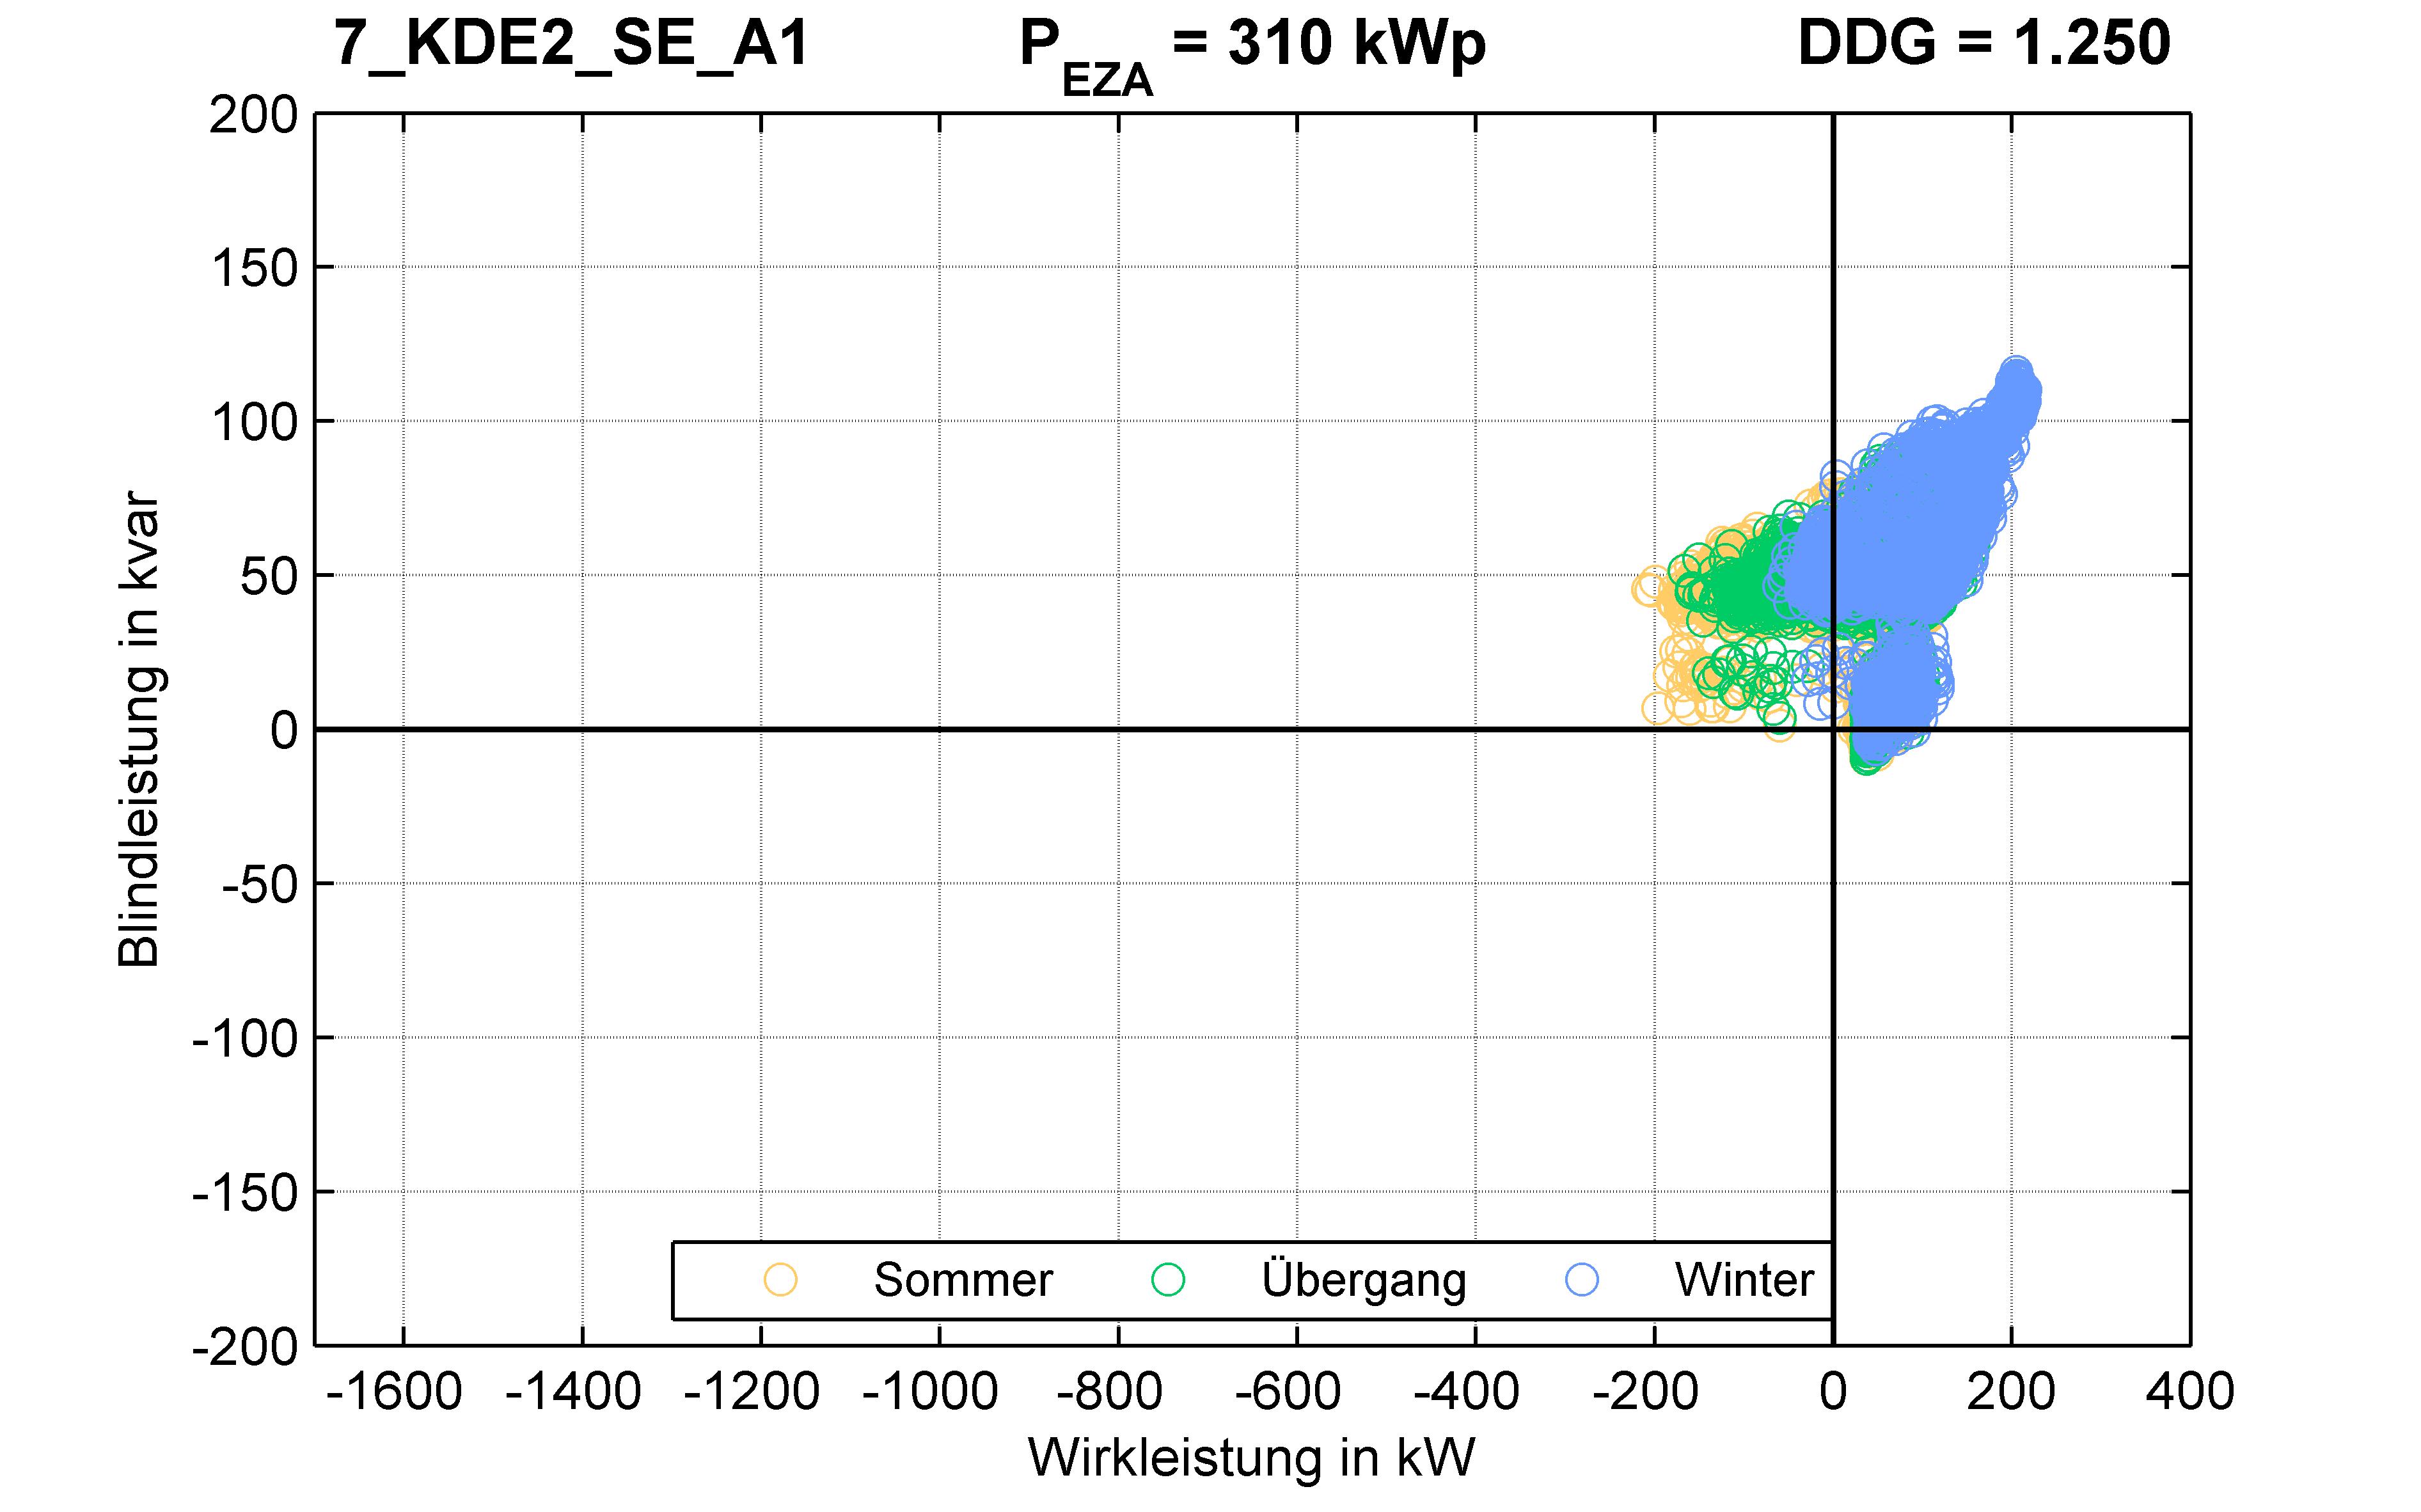 KDE2 | Längsregler (SE) A1 | PQ-Verhalten